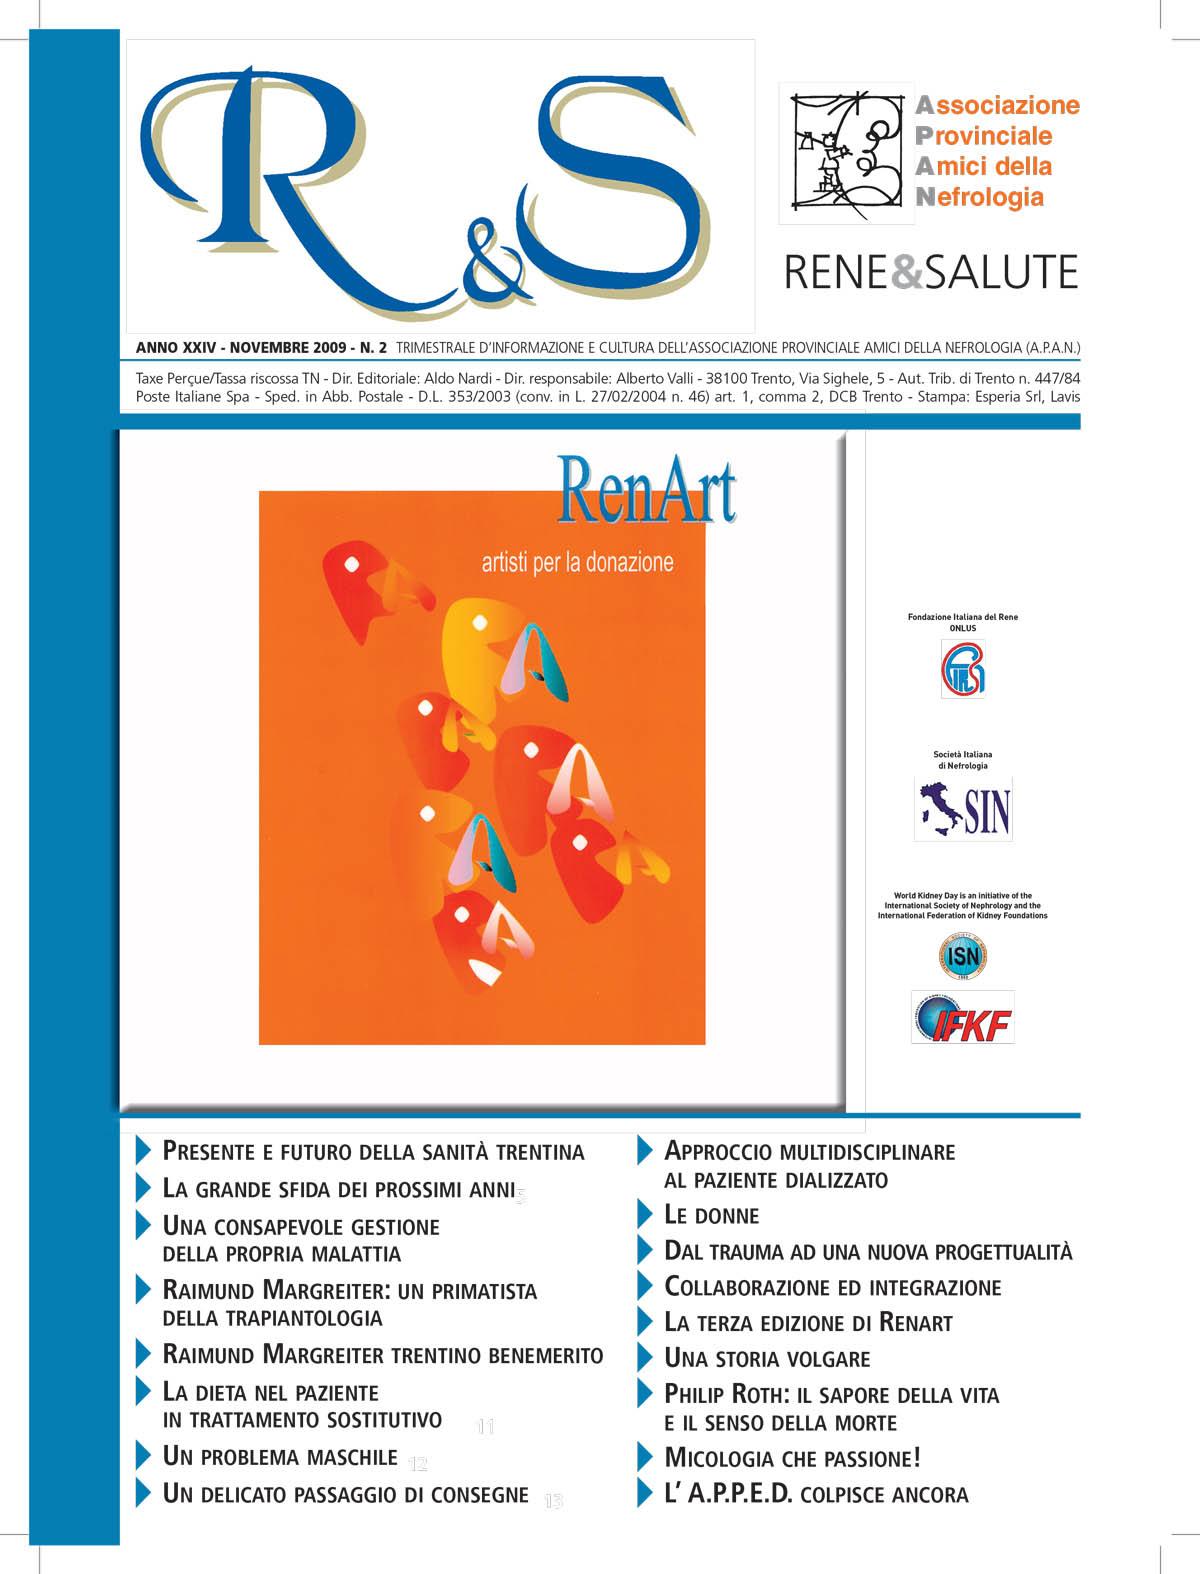 Rene & Salute 2009.2